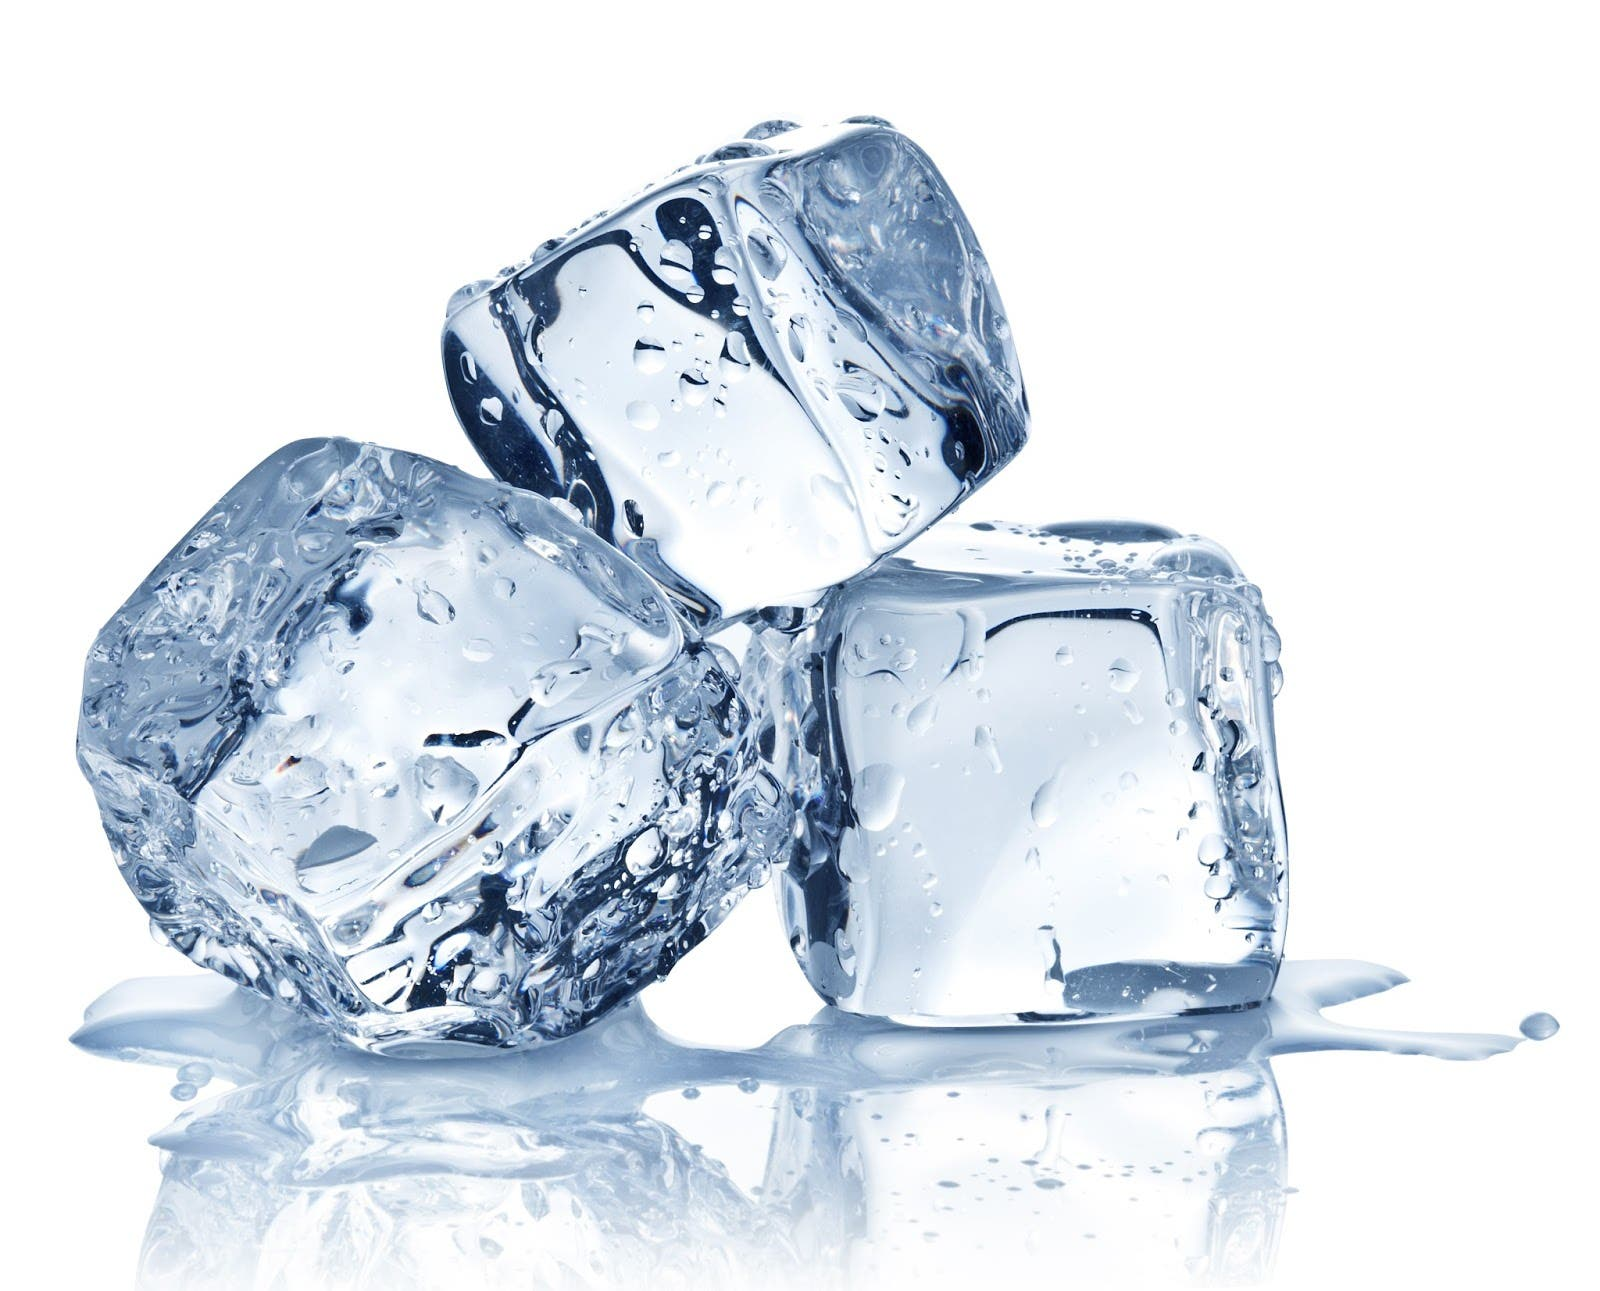 ice shutterstock